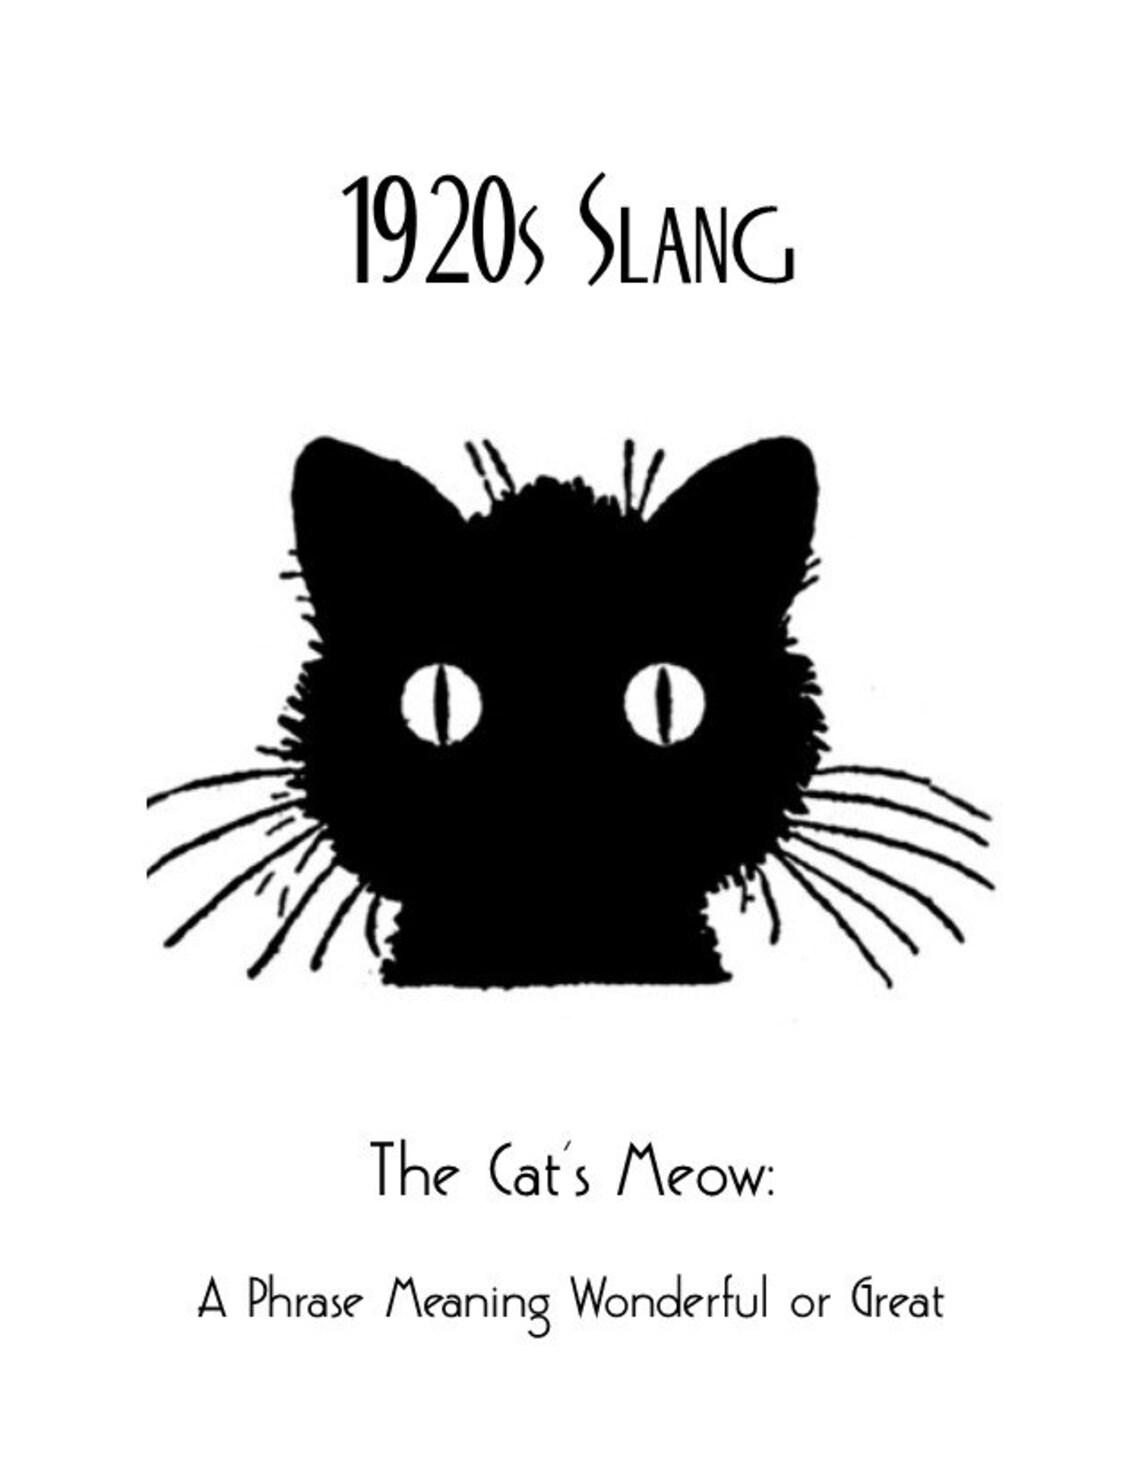 1920s art deco slang poster cats meow poster vintage black etsy Black Cat 1920 X 1080 50